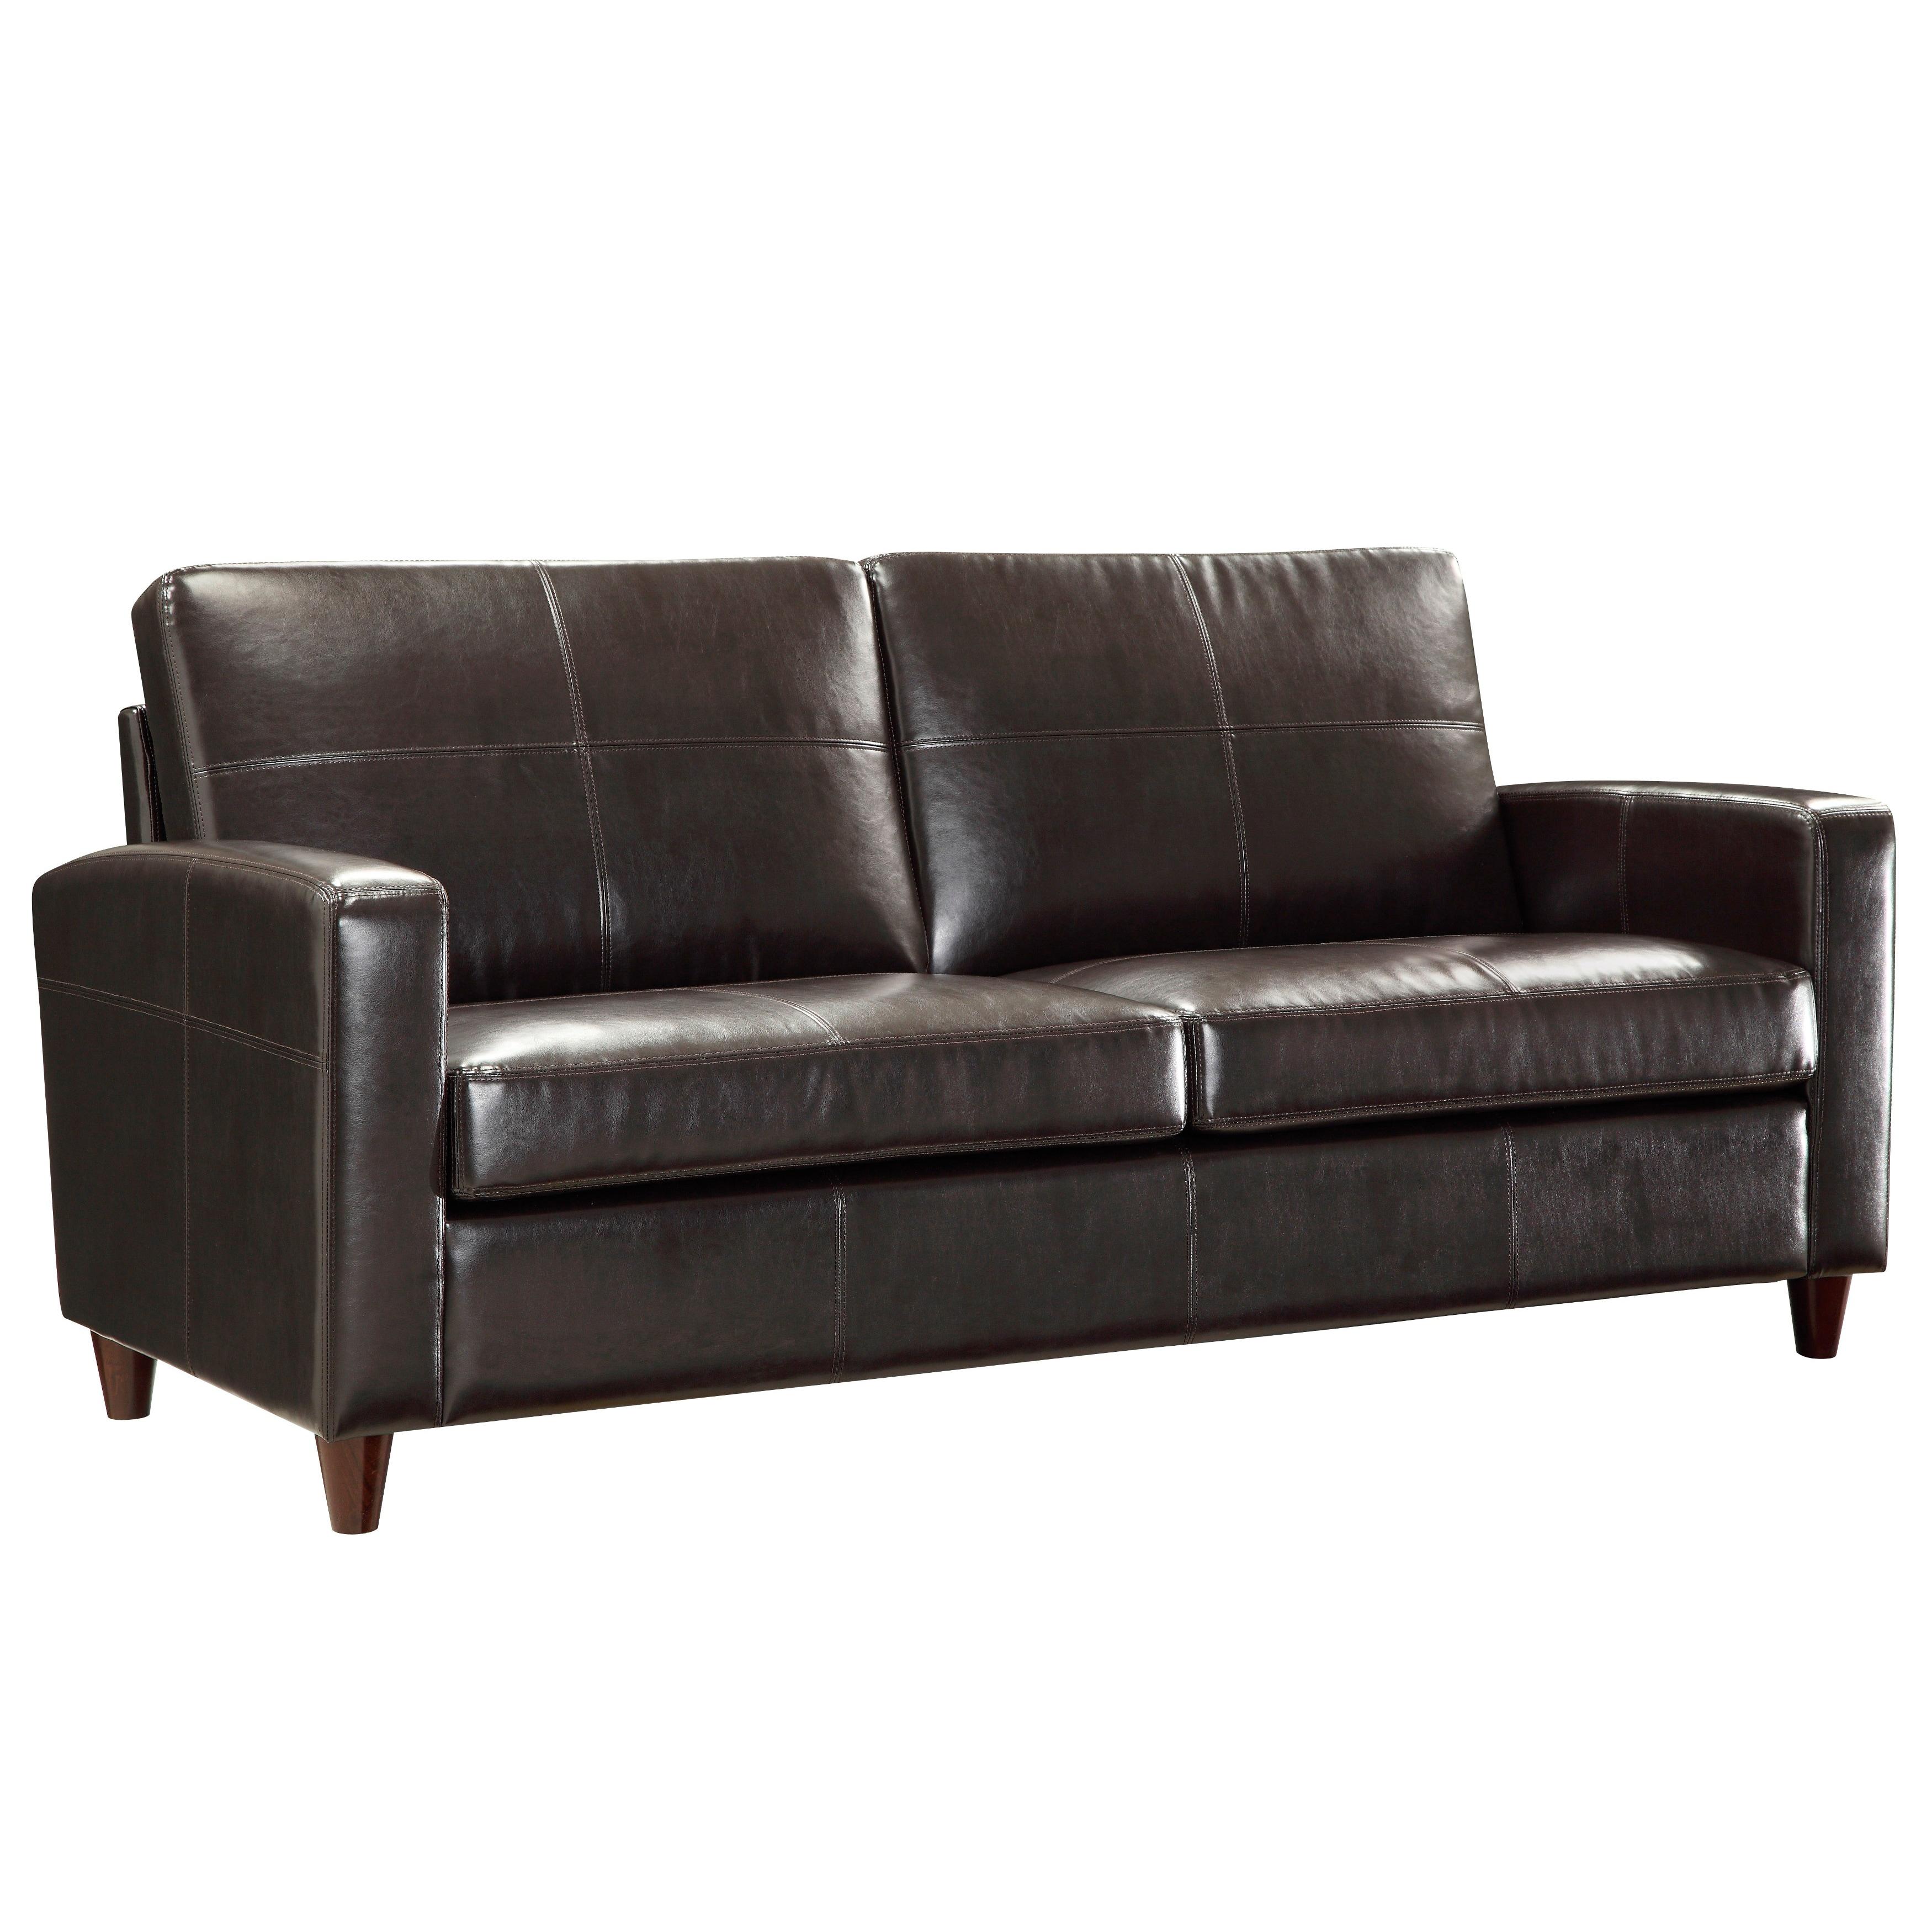 Office Star Espresso Bonded Leather Sofa With Espresso Finish Legs - N/A